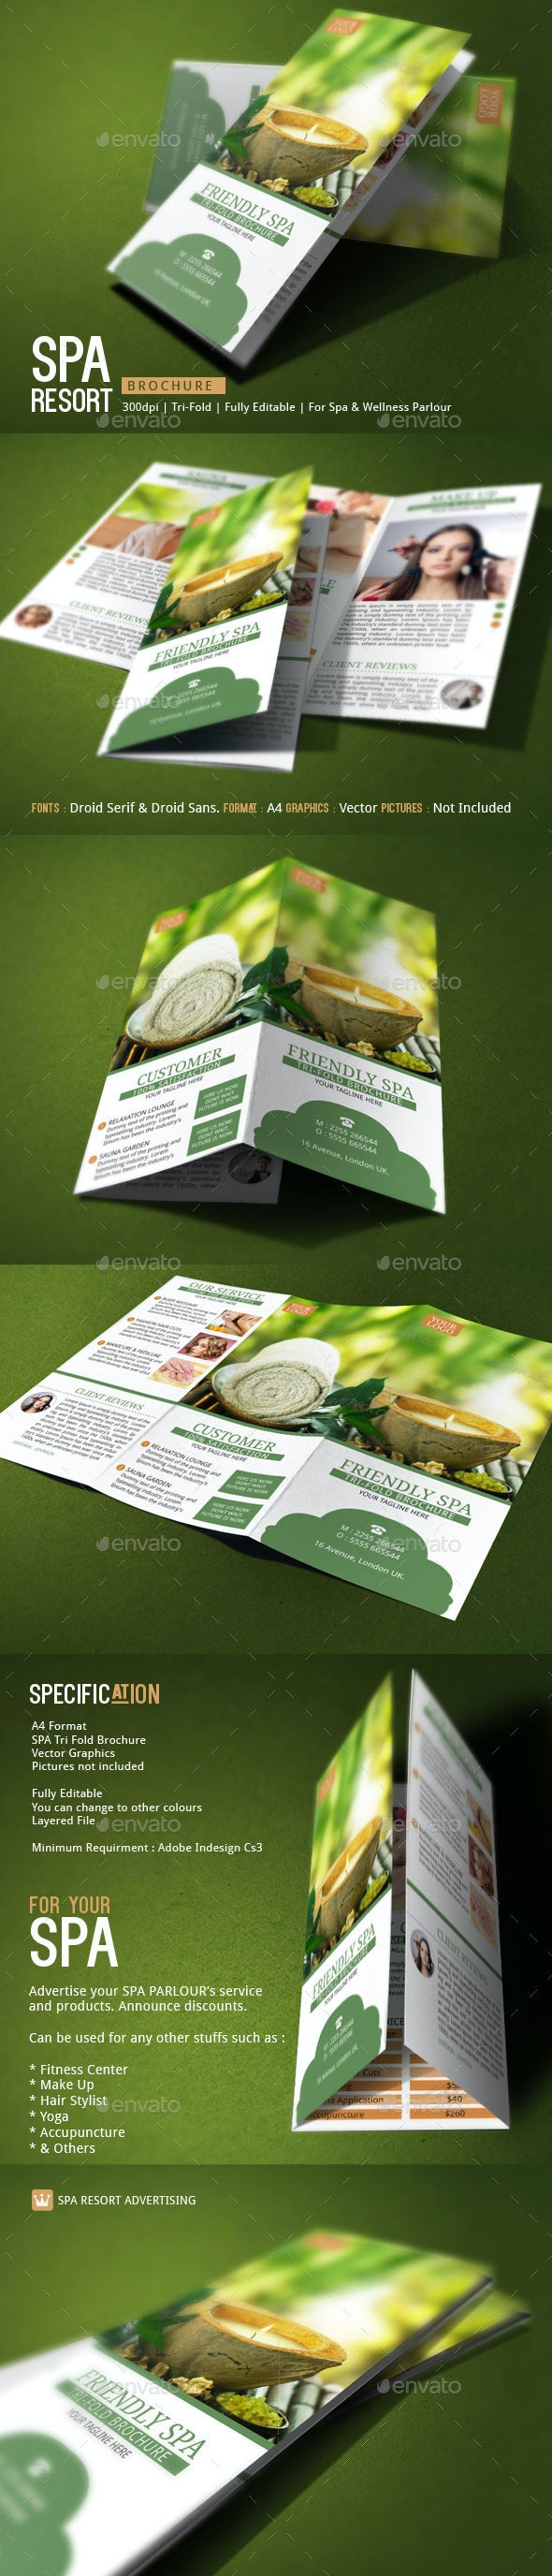 Spa Resort Brochure Template - Corporate Brochures